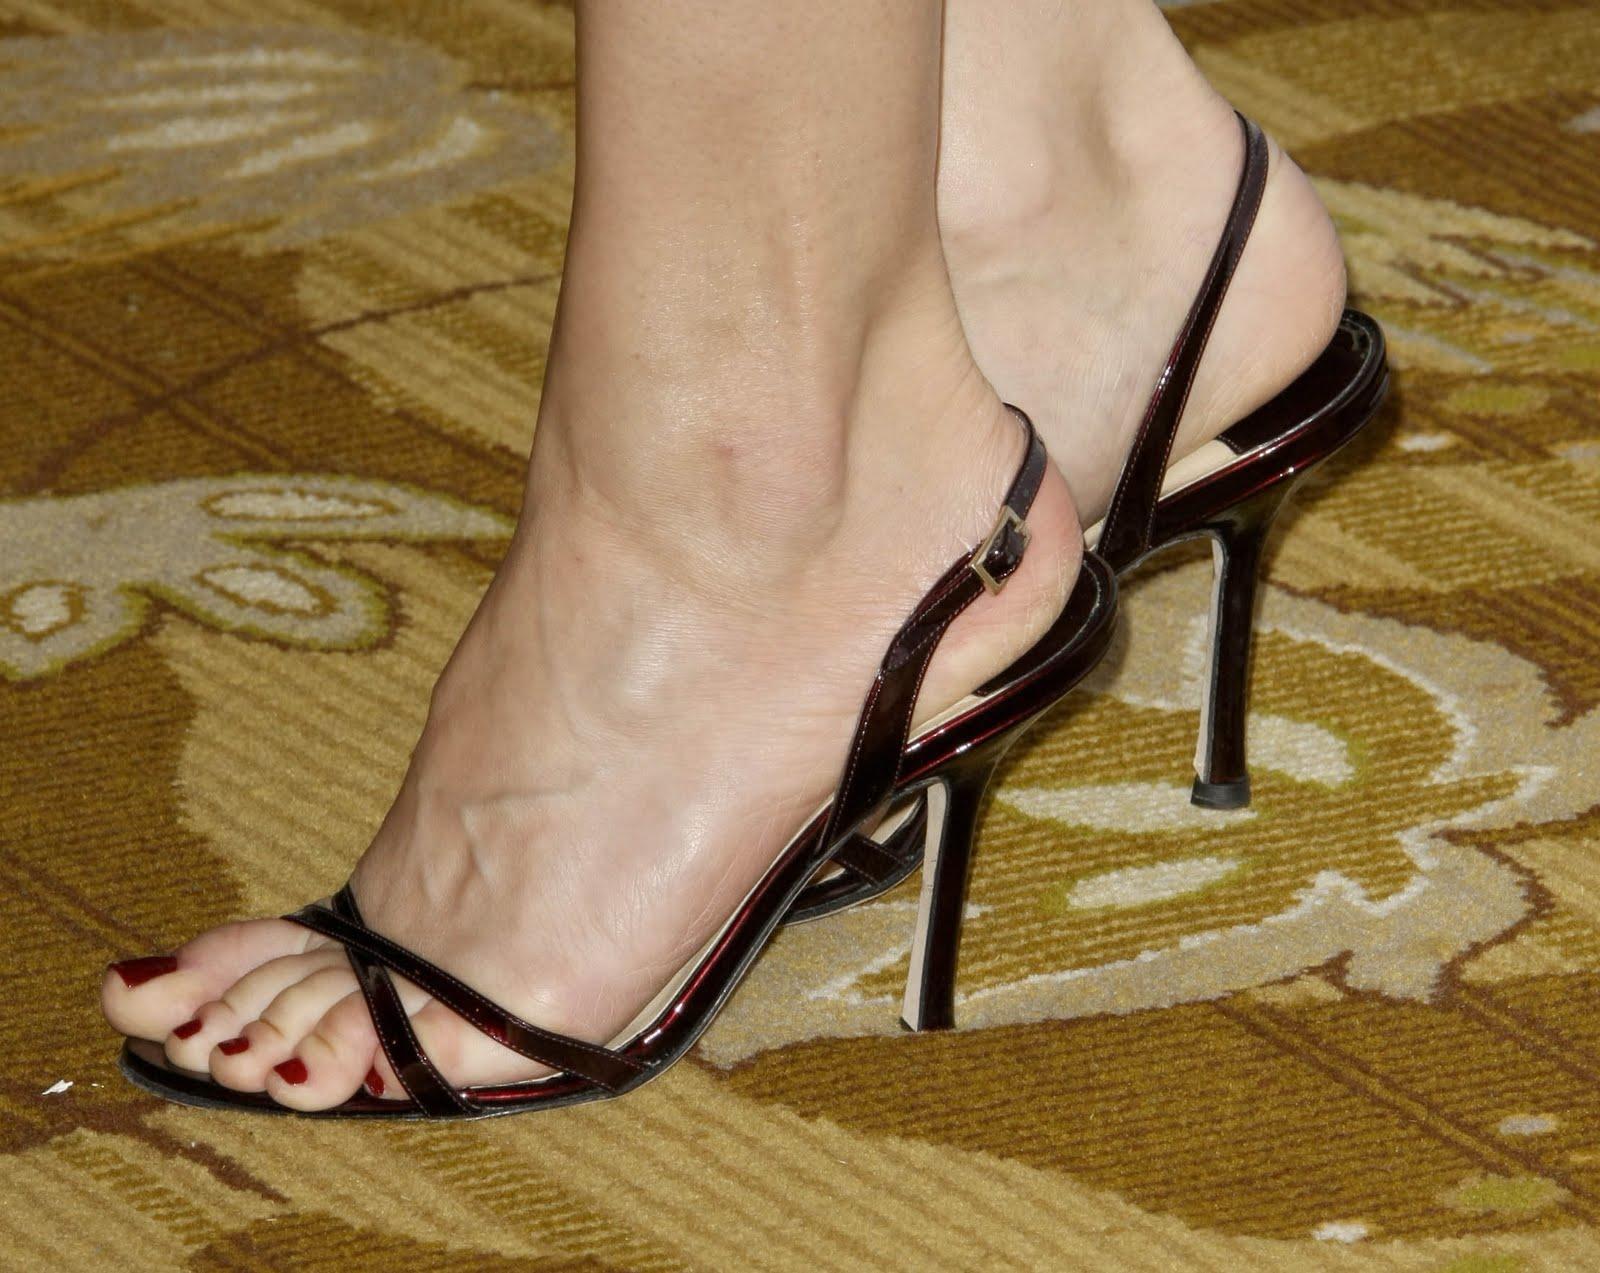 http://2.bp.blogspot.com/_UaLWp72nij4/S9nr8MjSJxI/AAAAAAAAJIw/CsApqy_QcWk/s1600/jennifer-morrison-feet.jpg